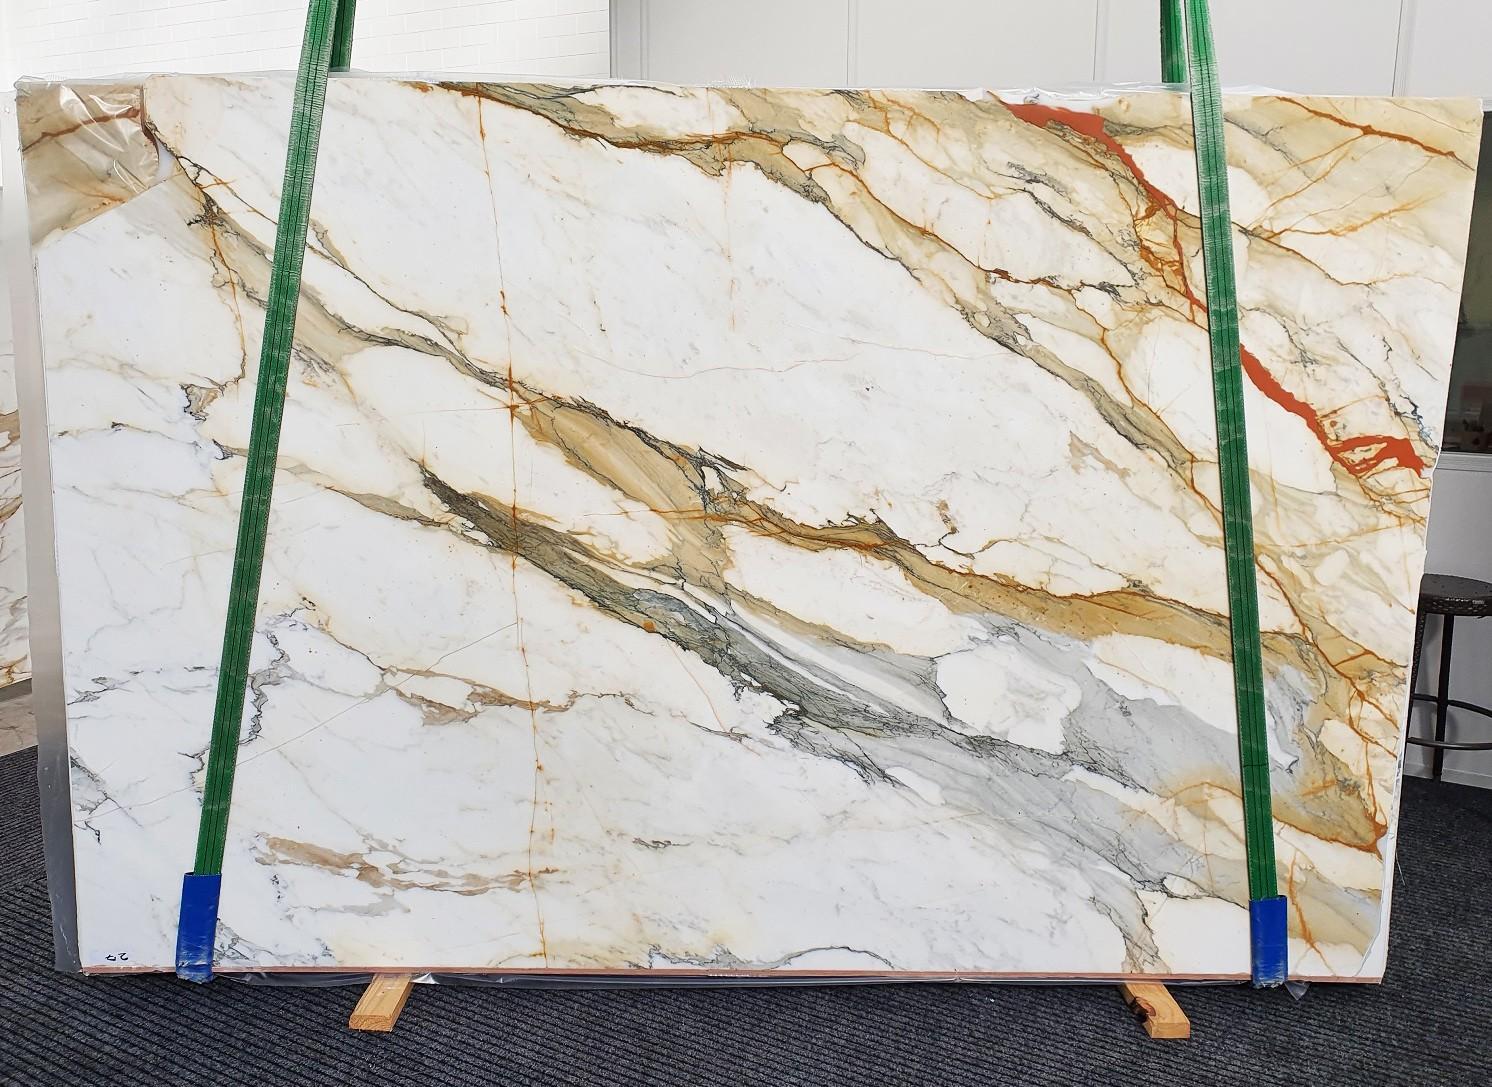 CALACATTA MACCHIAVECCHIA polierte Unmaßplatten 1422 aus Natur Marmor , Slab #27: Lieferung Veneto, Italien